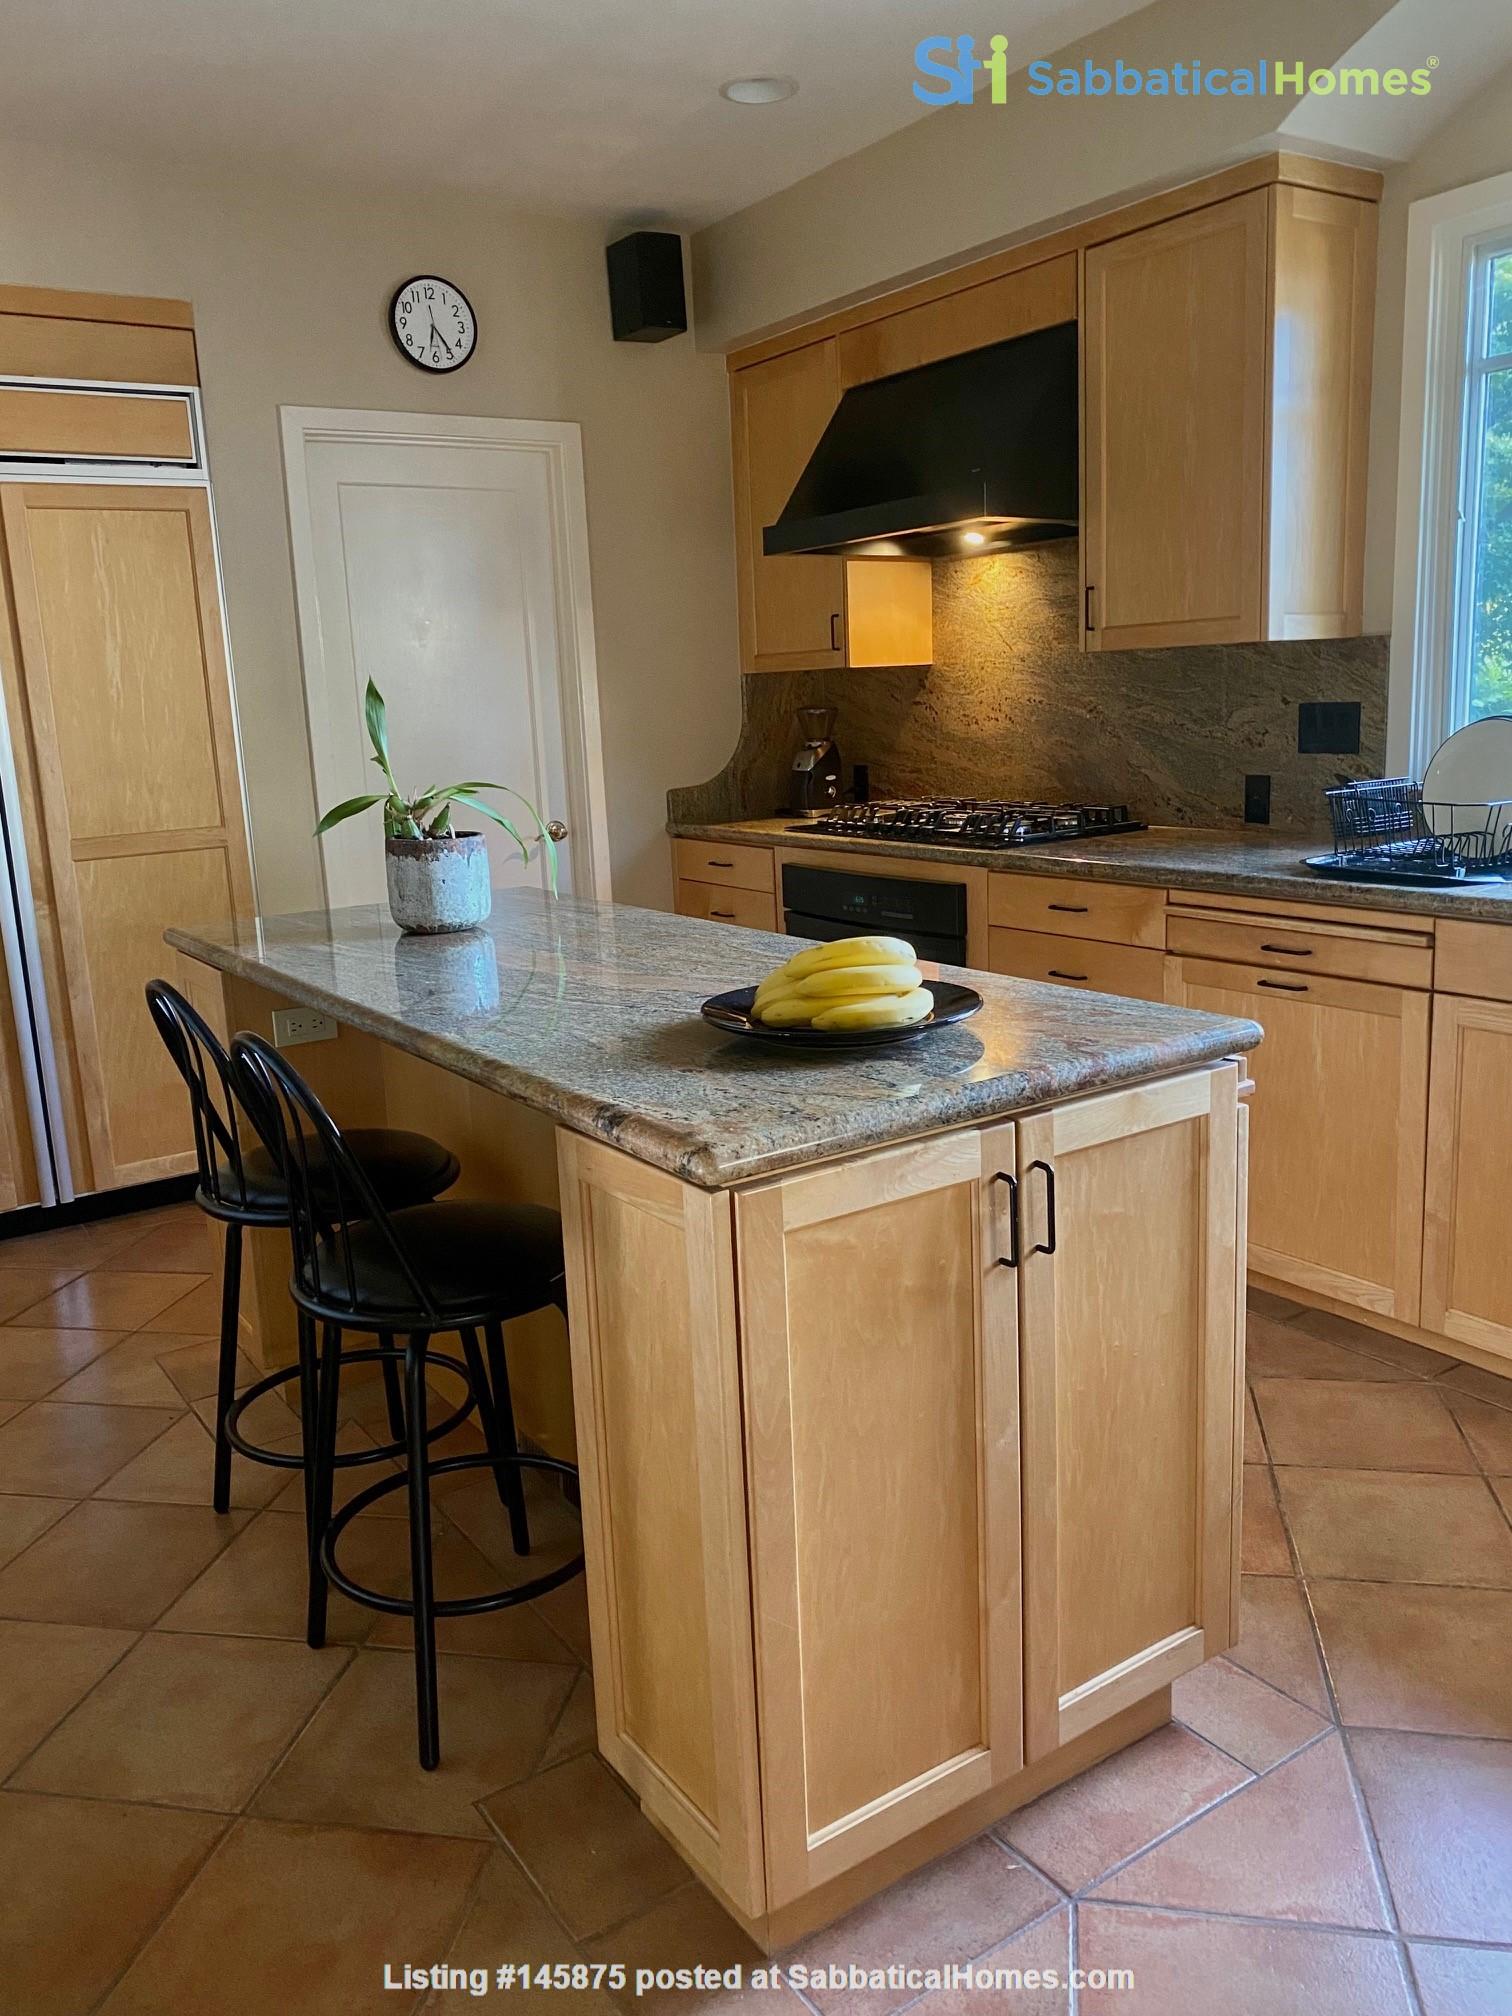 Beautiful 4 Bedroom Craftsman Home in Highly Rated Piedmont School District Home Rental in Piedmont 0